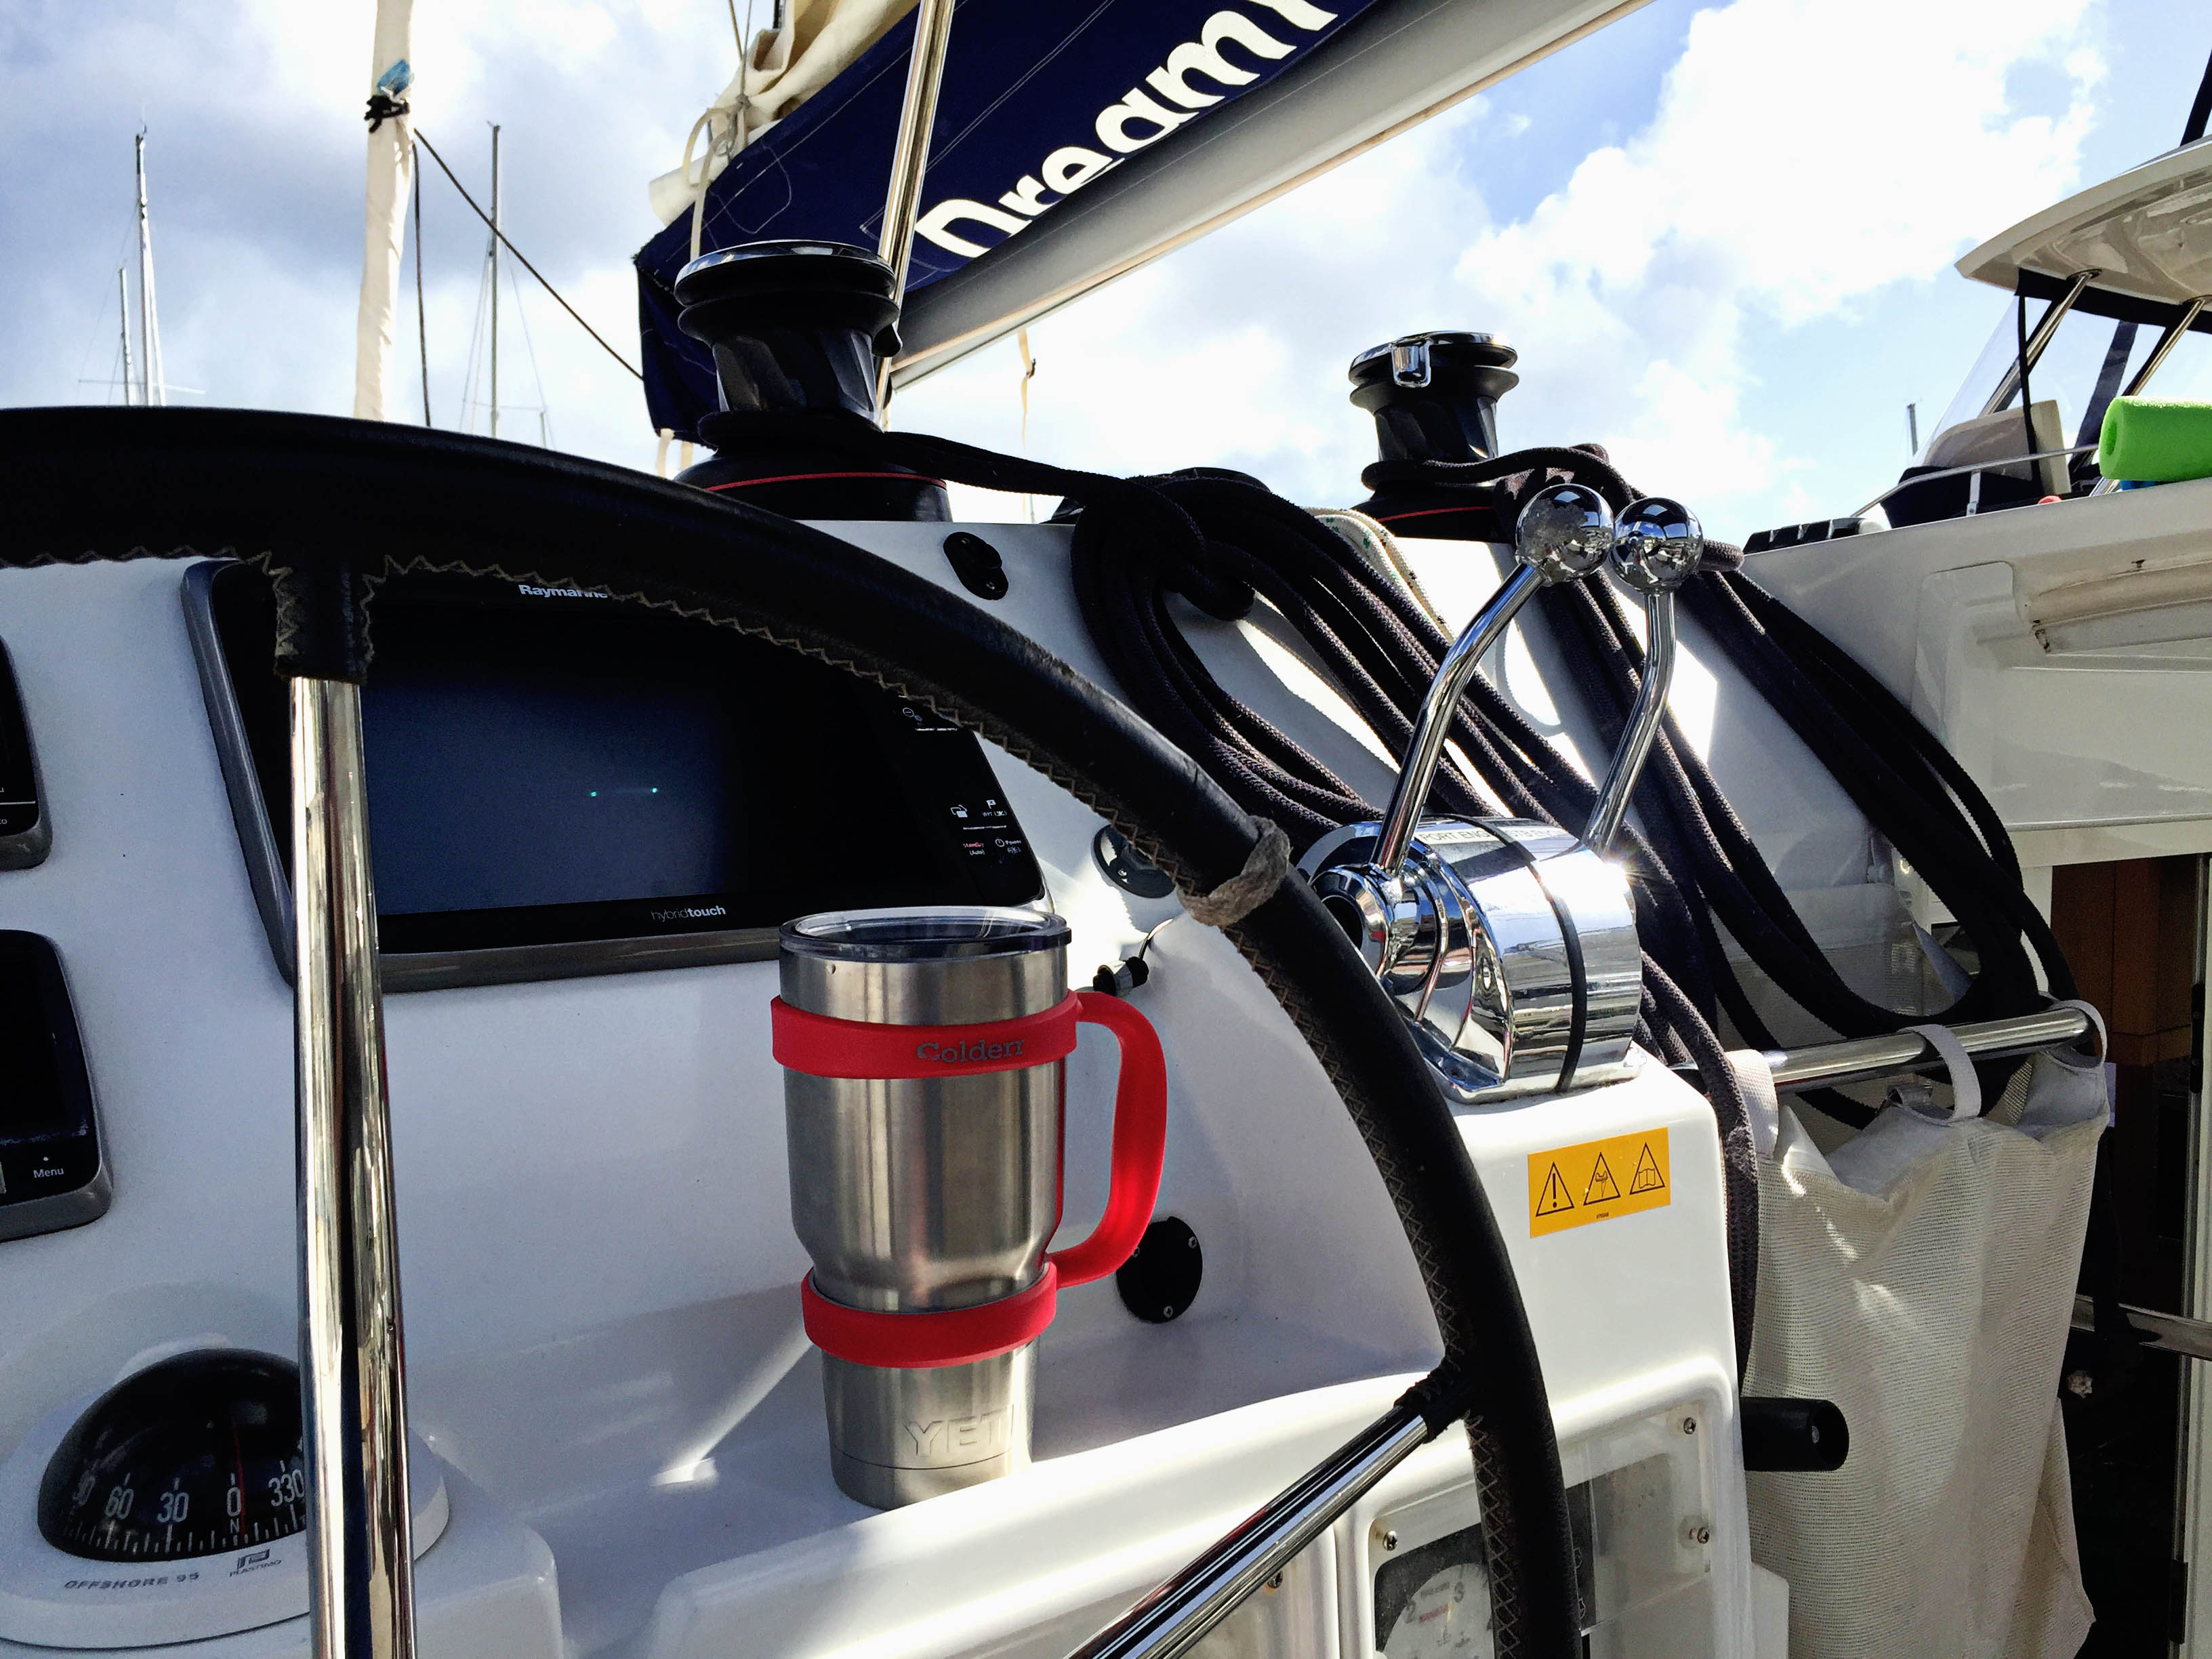 Colderr YETI handle | Sailing British Virgin Islands Itinerary | Hi Lovely